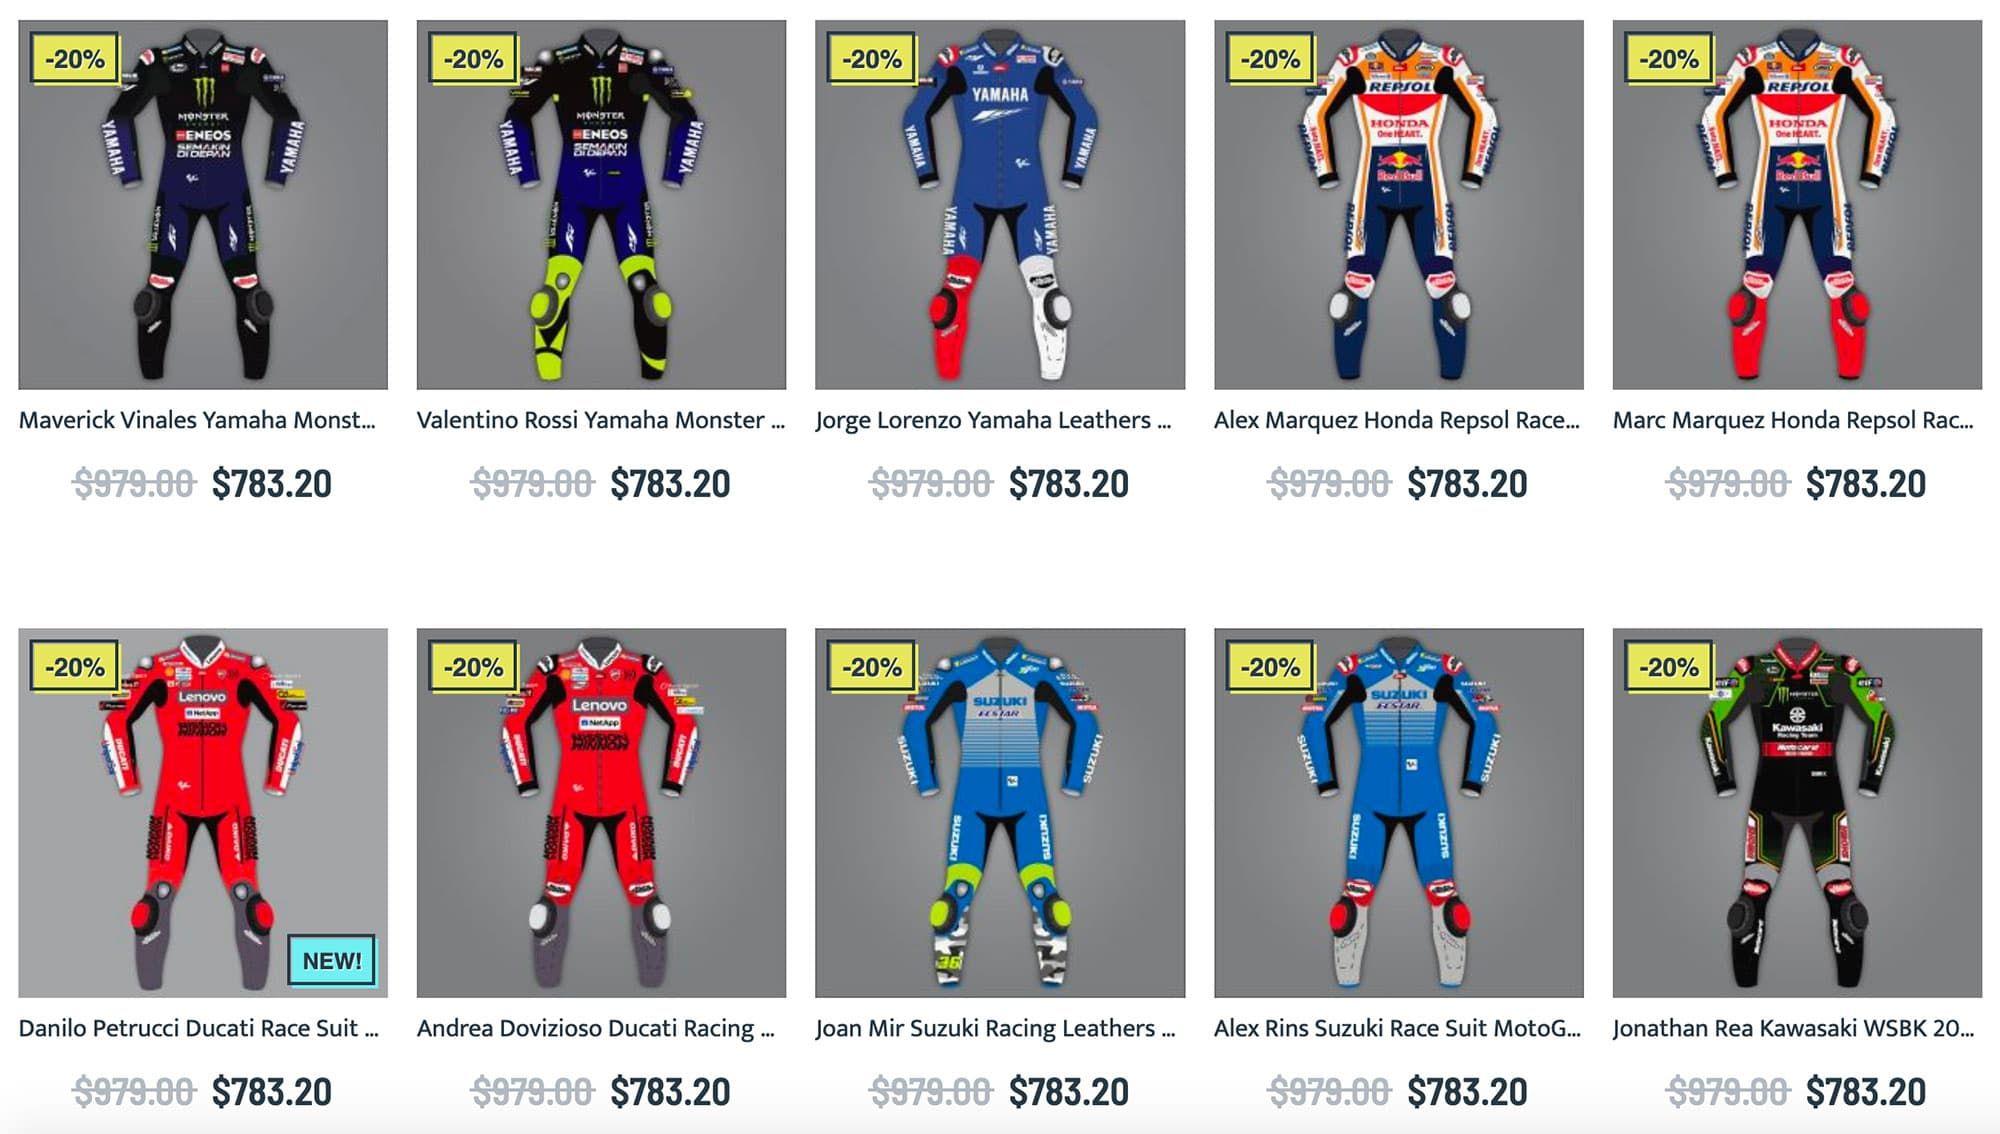 Explore The Vast Collection Of Motogp 2020 Motorcycle Racing Suit Valentino Rossi Marc Marquez Andrea Dovizisos Andr In 2020 Motorcycle Race Suit Racing Suit Motogp